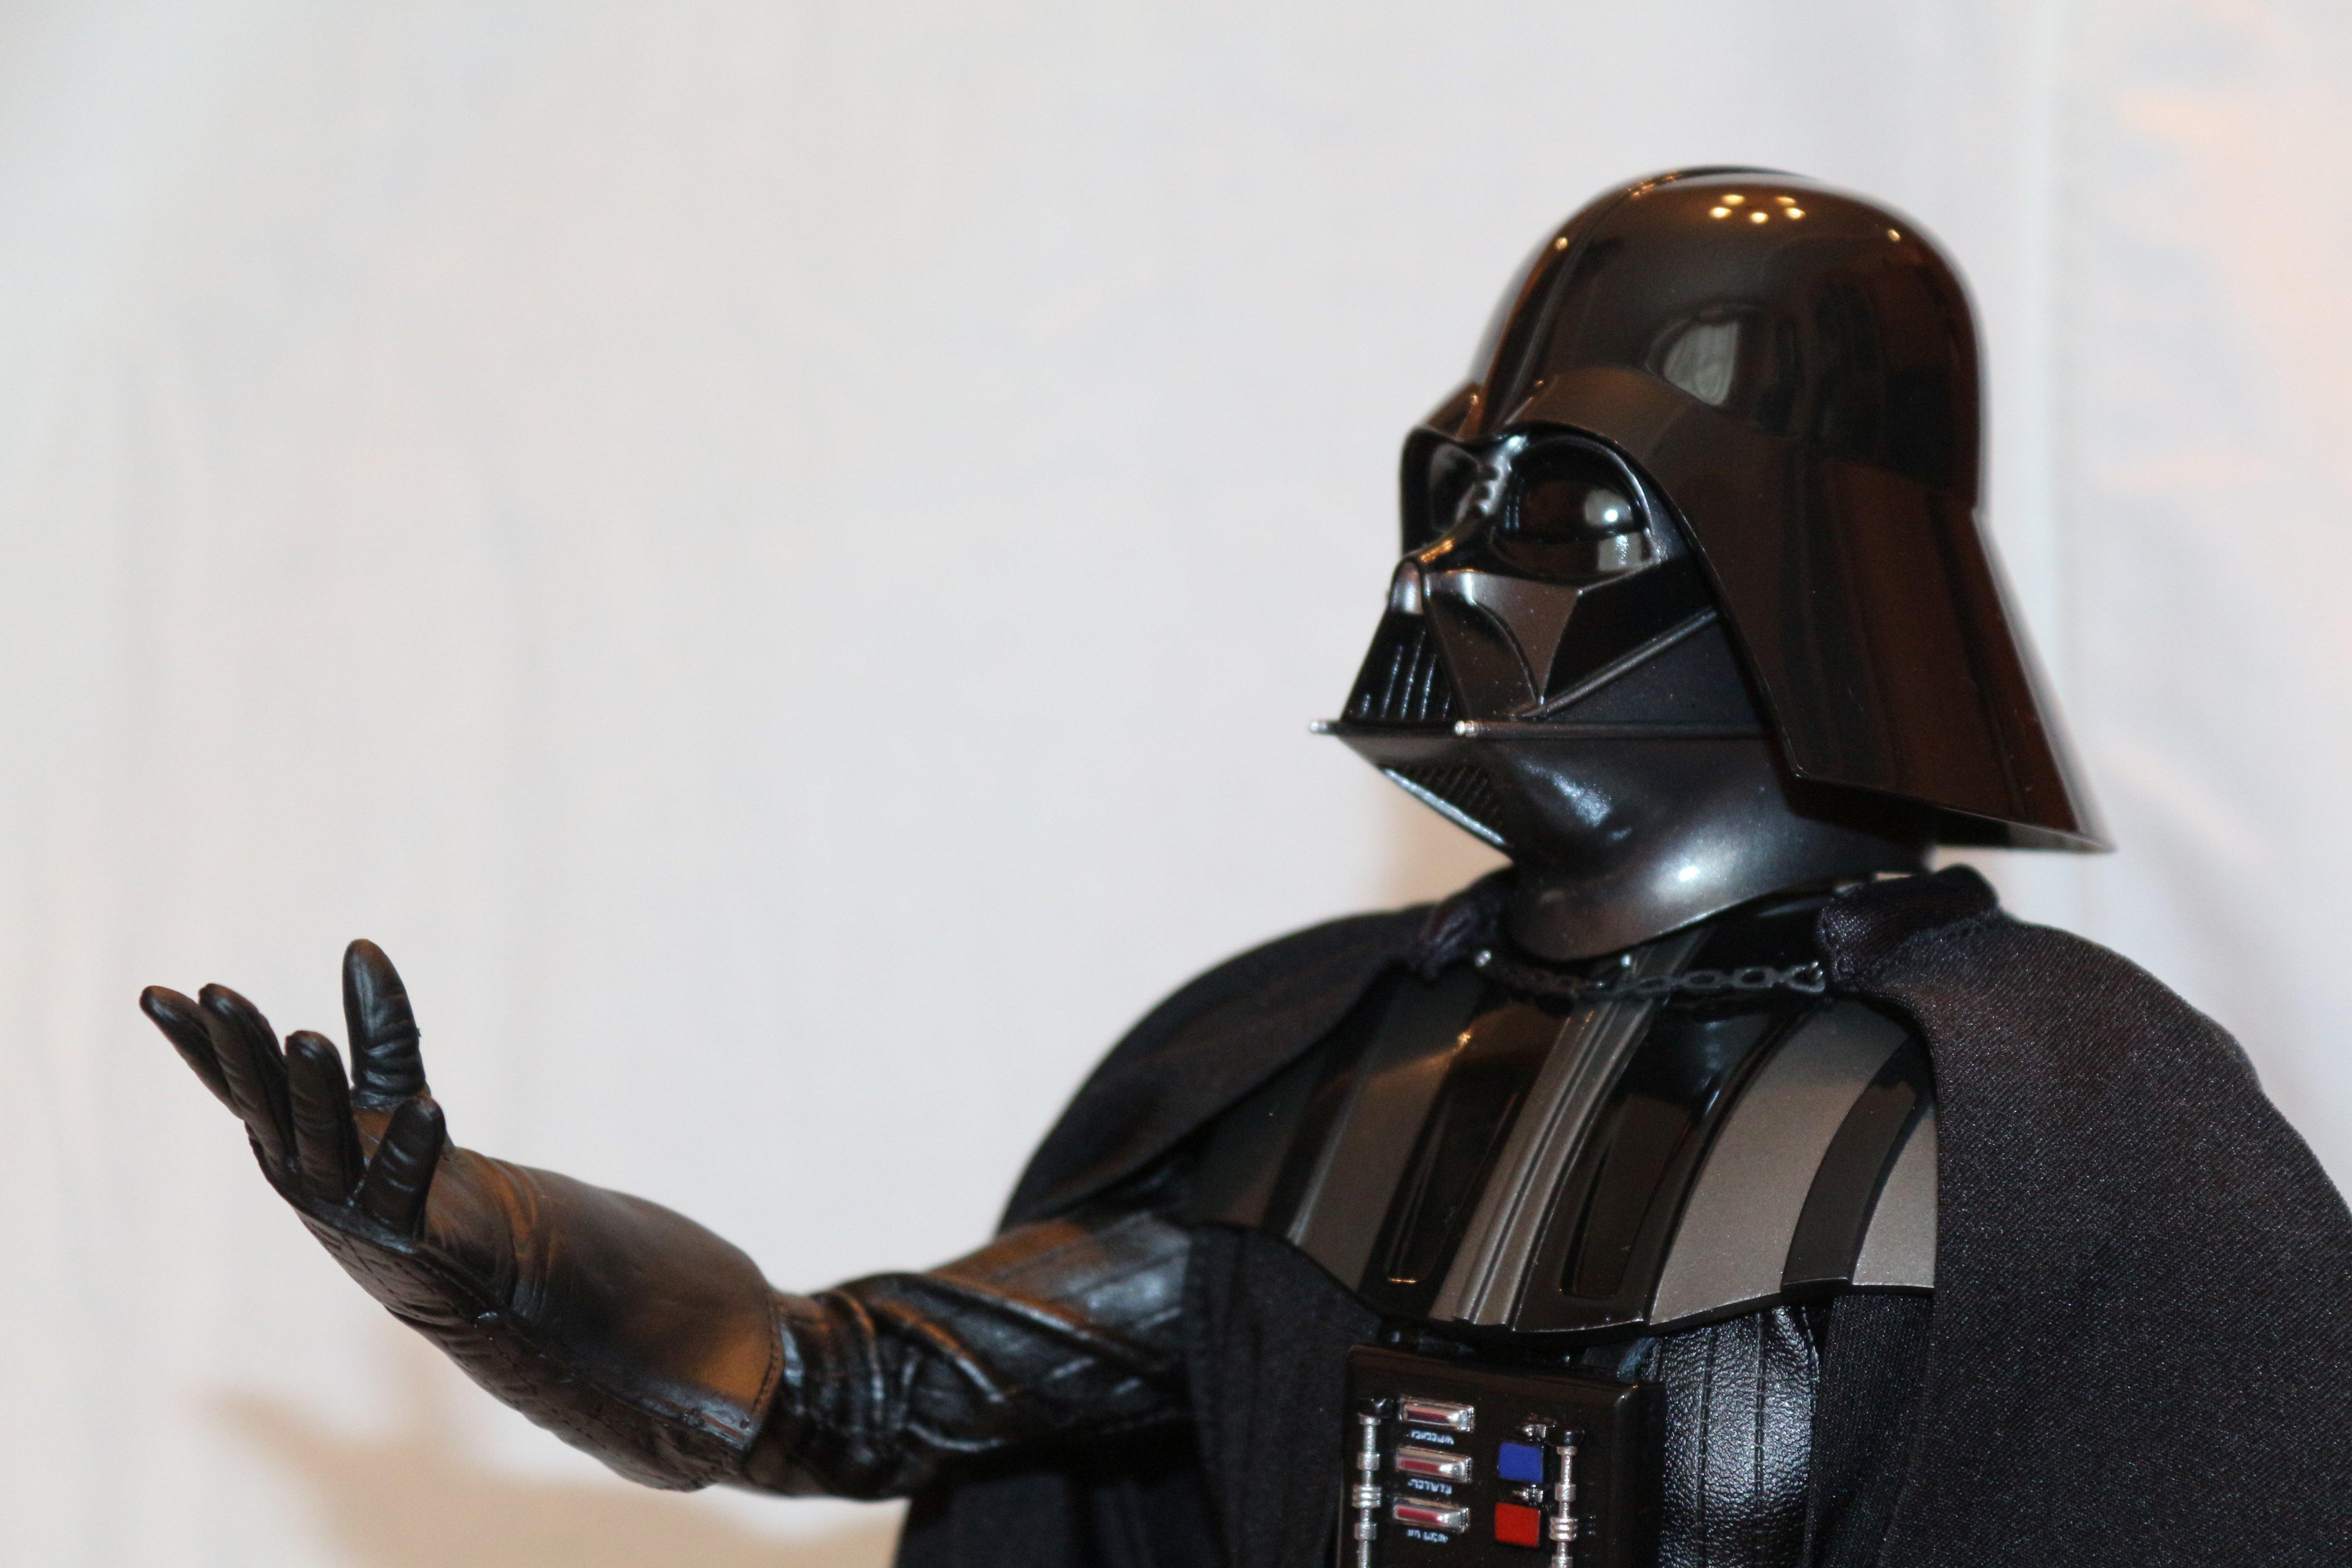 Sideshow Star Wars Deluxe Darth Vader 1/6 Scale Figure. Фотообзор. - Изображение 28